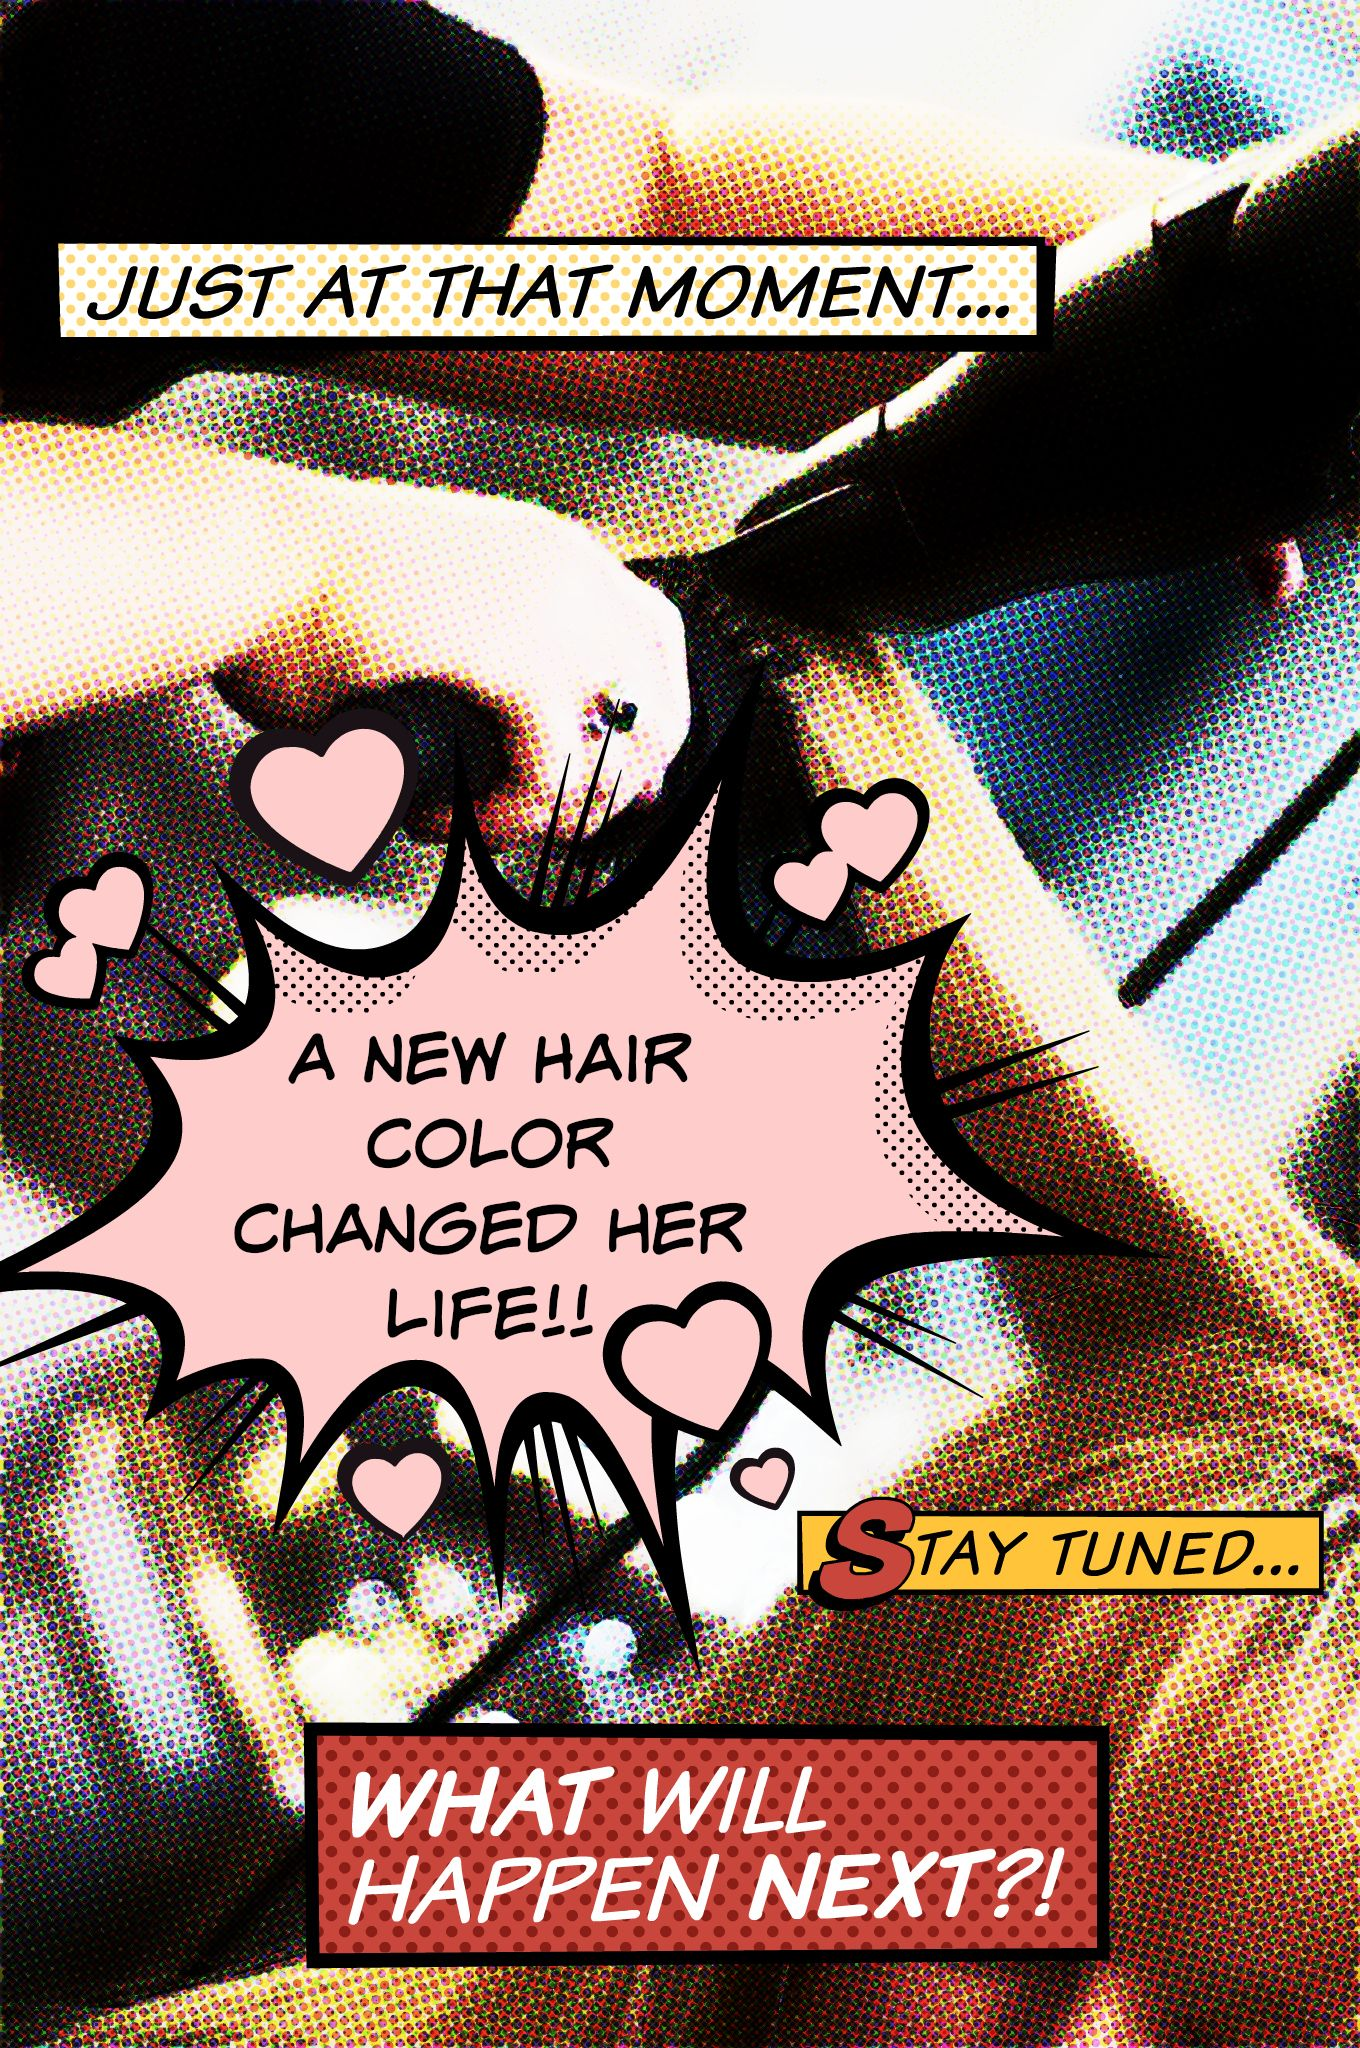 hair salon quote post for facebook hairsalon Hair salon